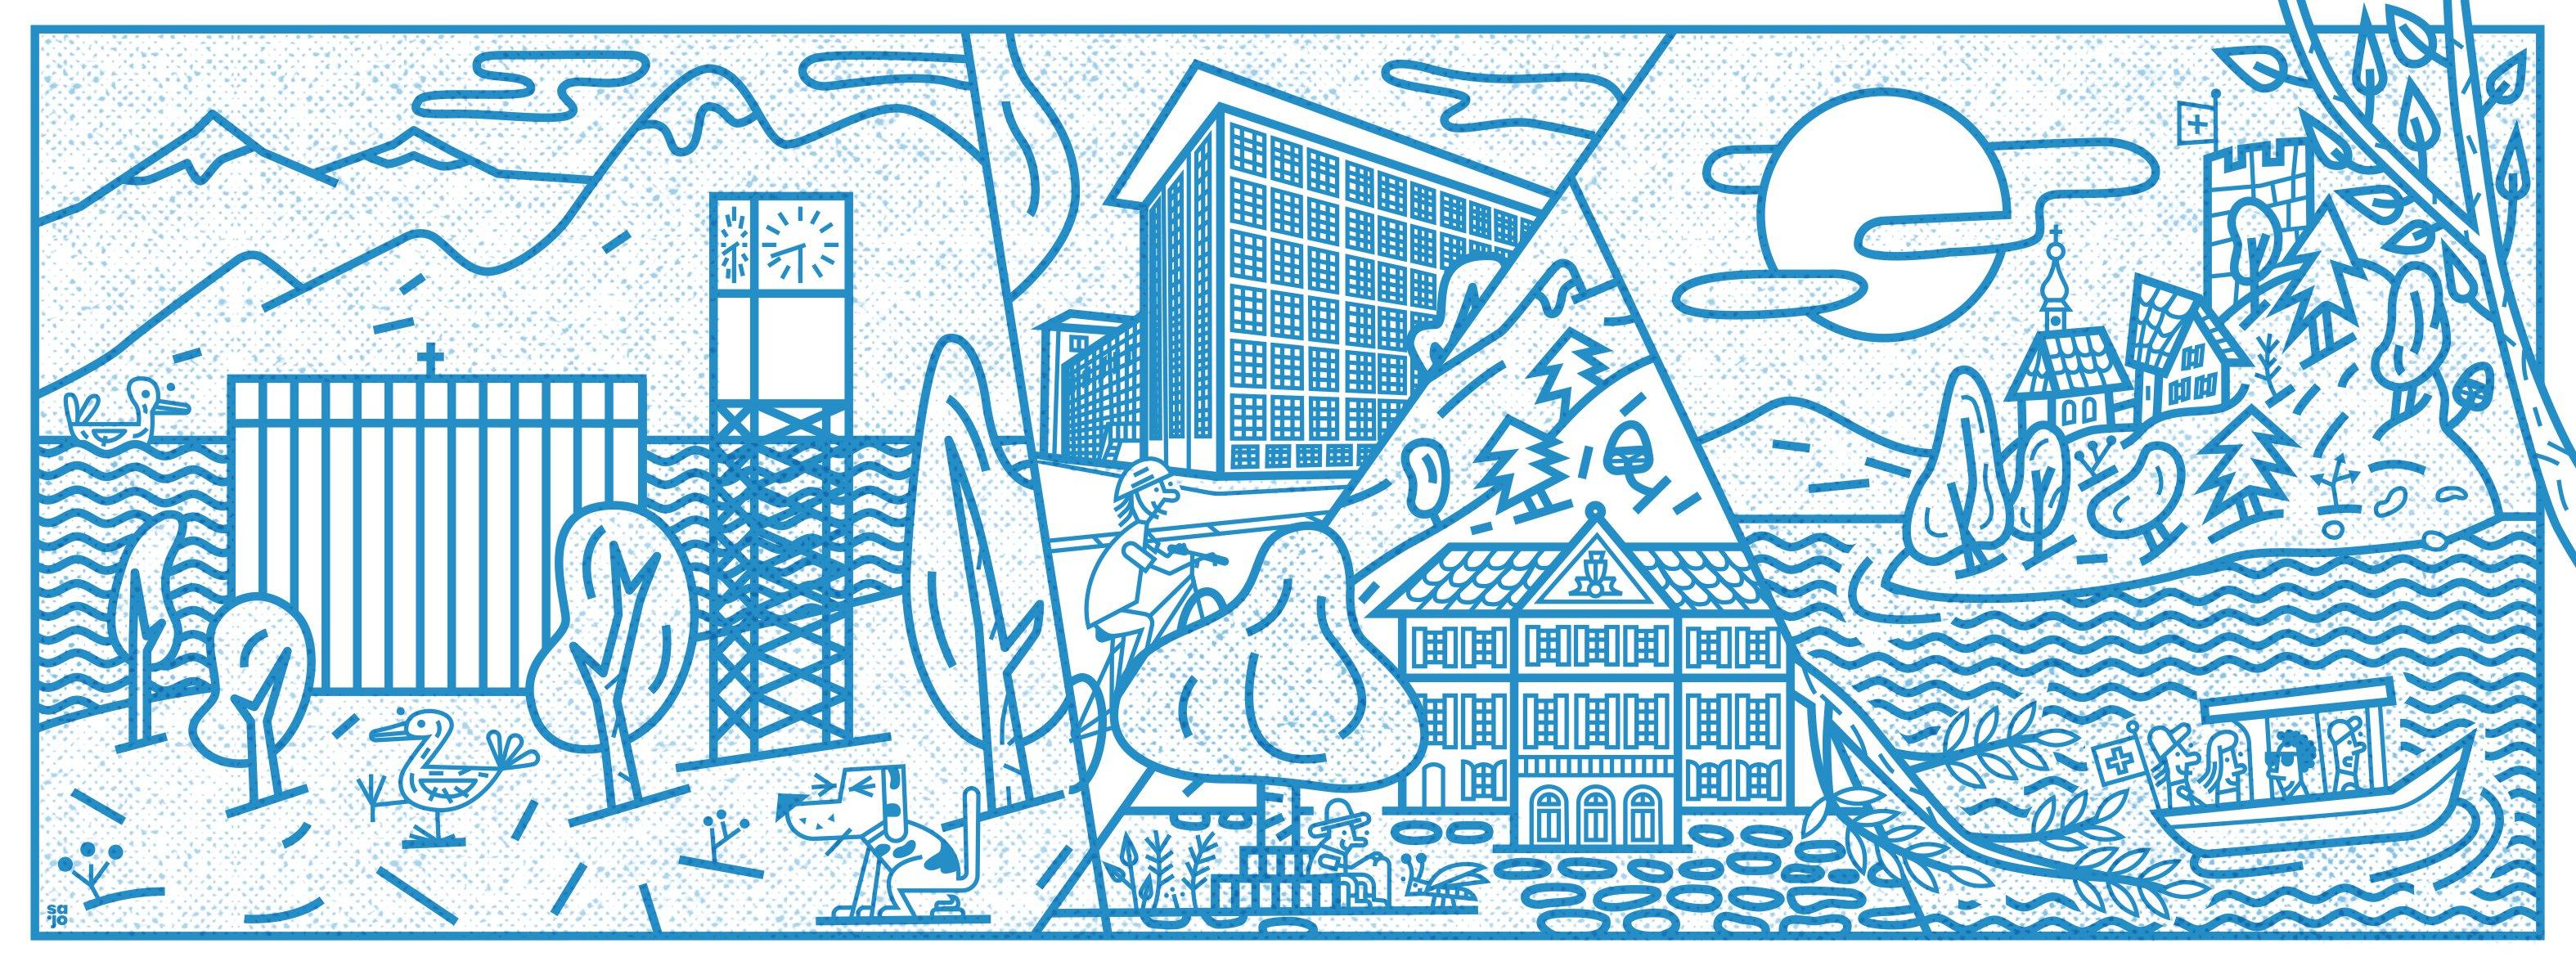 AS_illustration_sajo_final_print.jpg